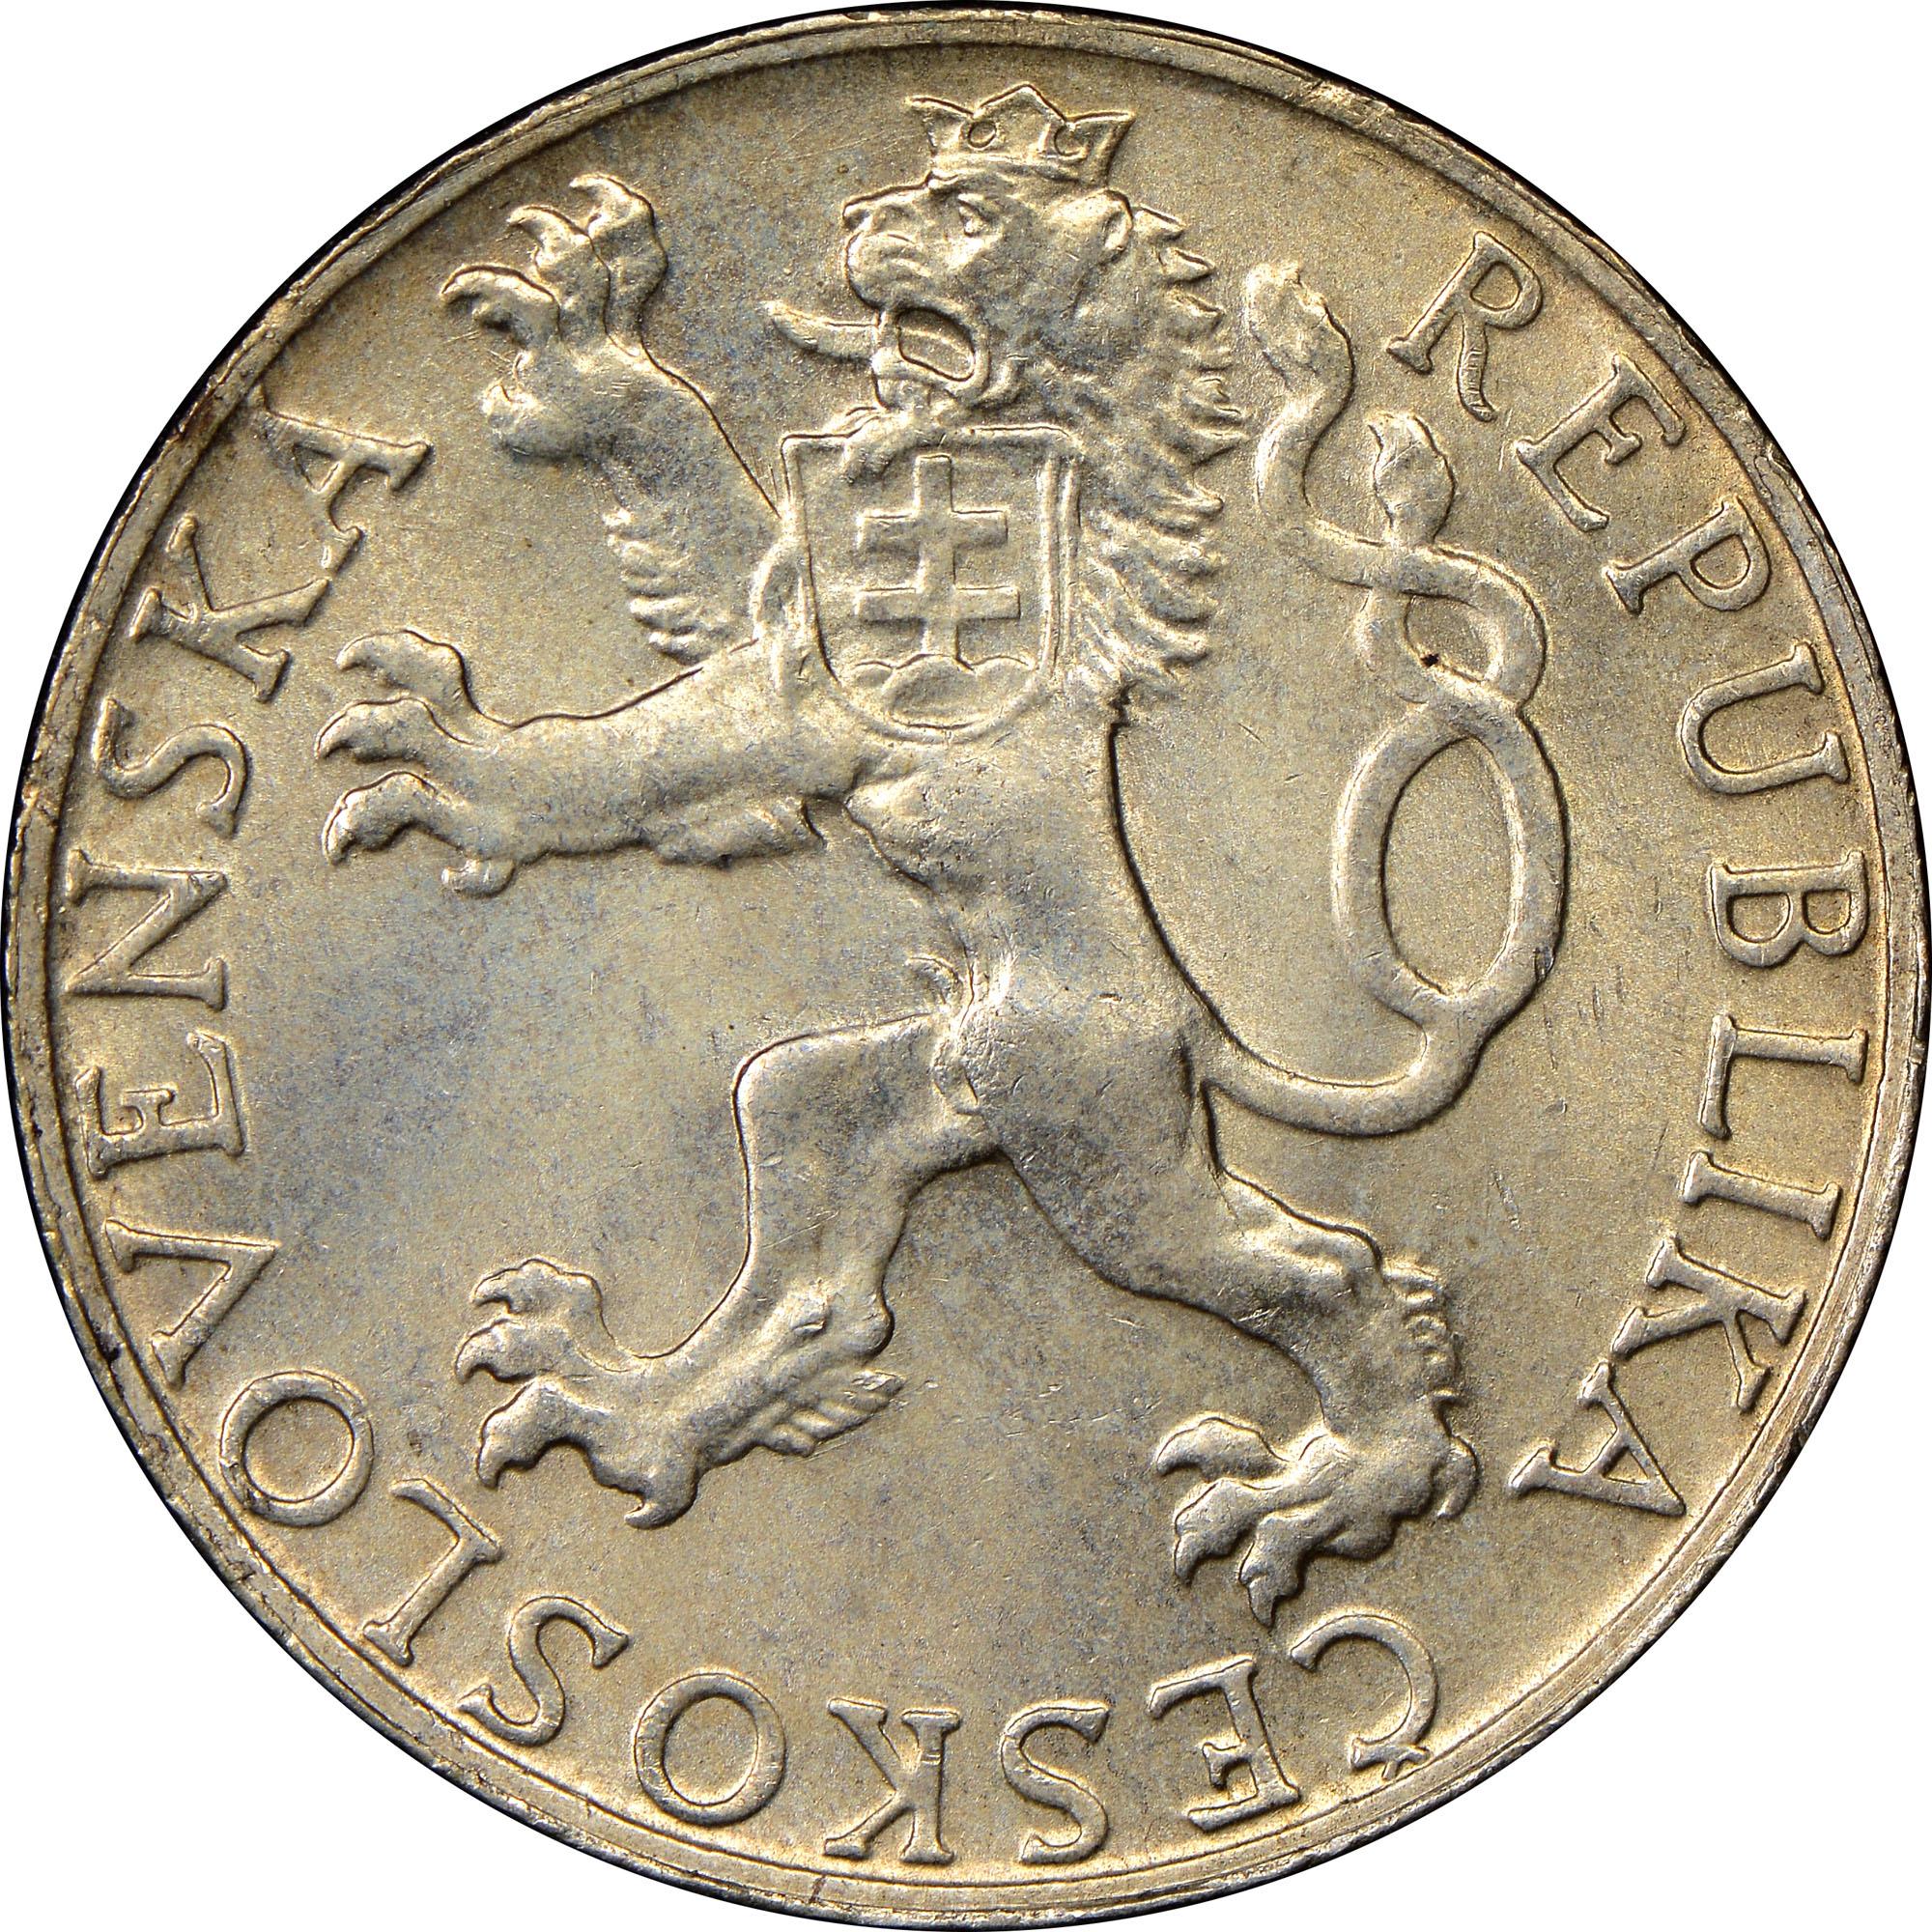 Czechoslovakia 50 Korun obverse